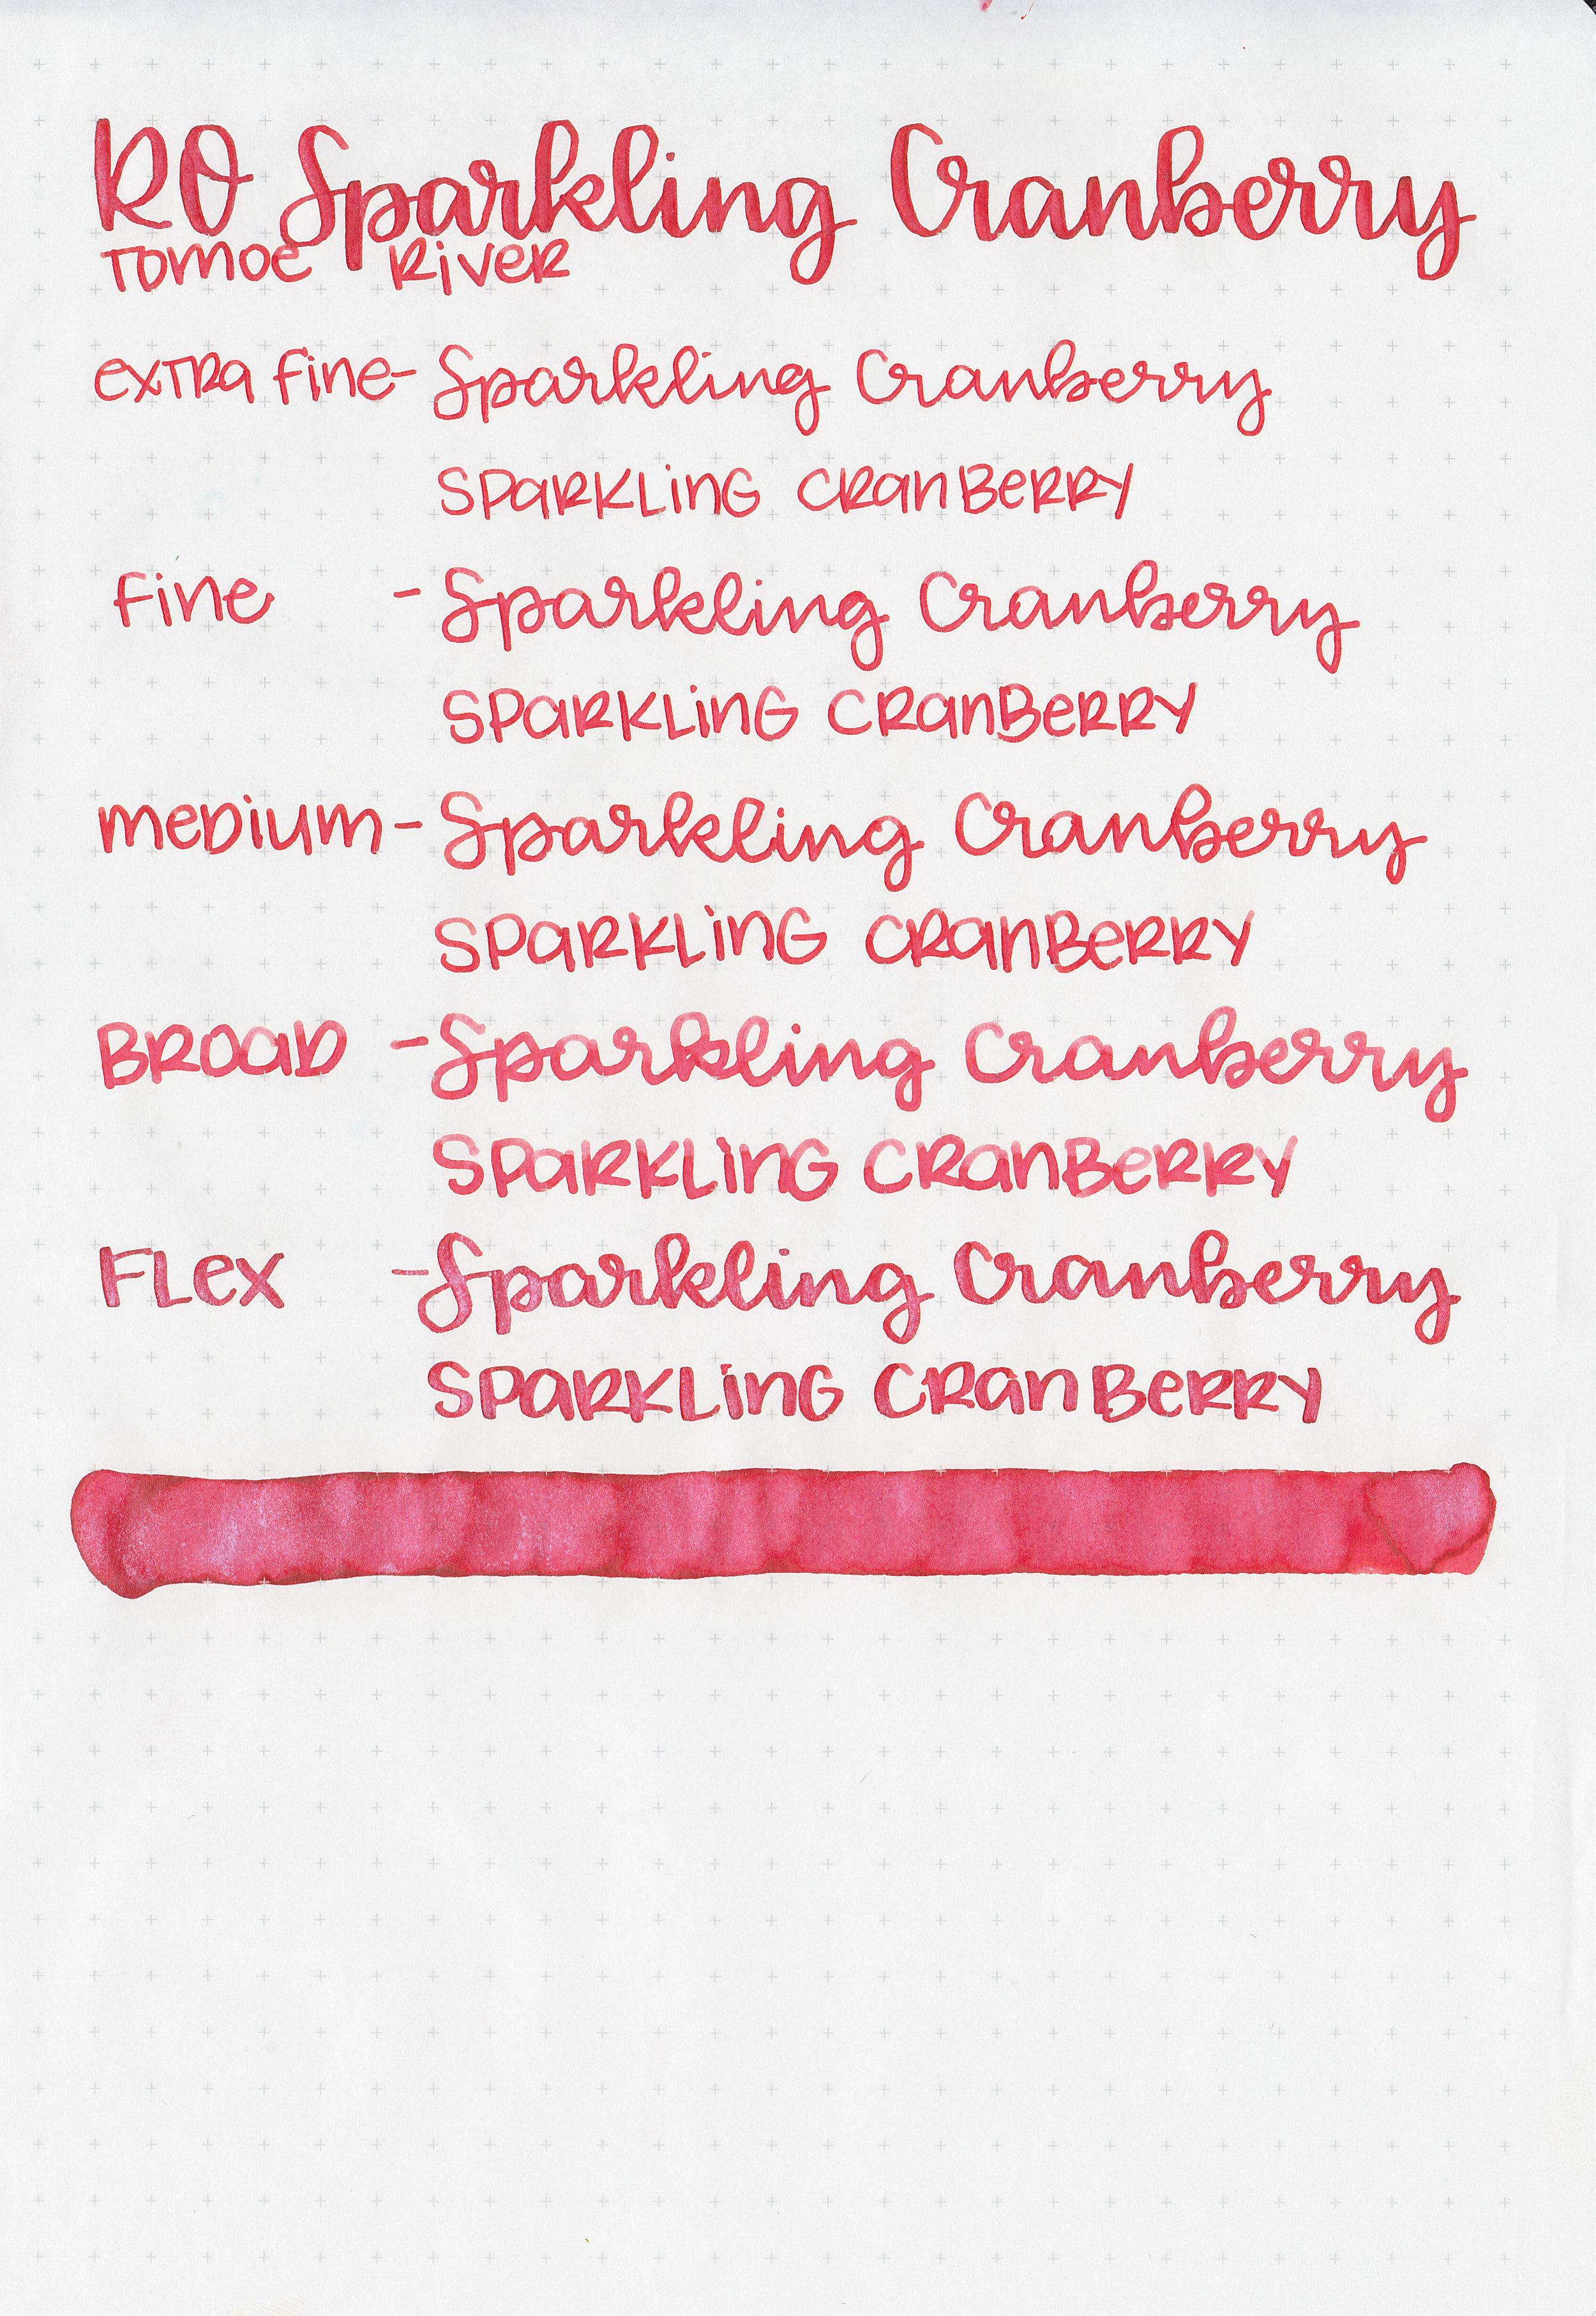 ro-sparkling-cranberry-6.jpg